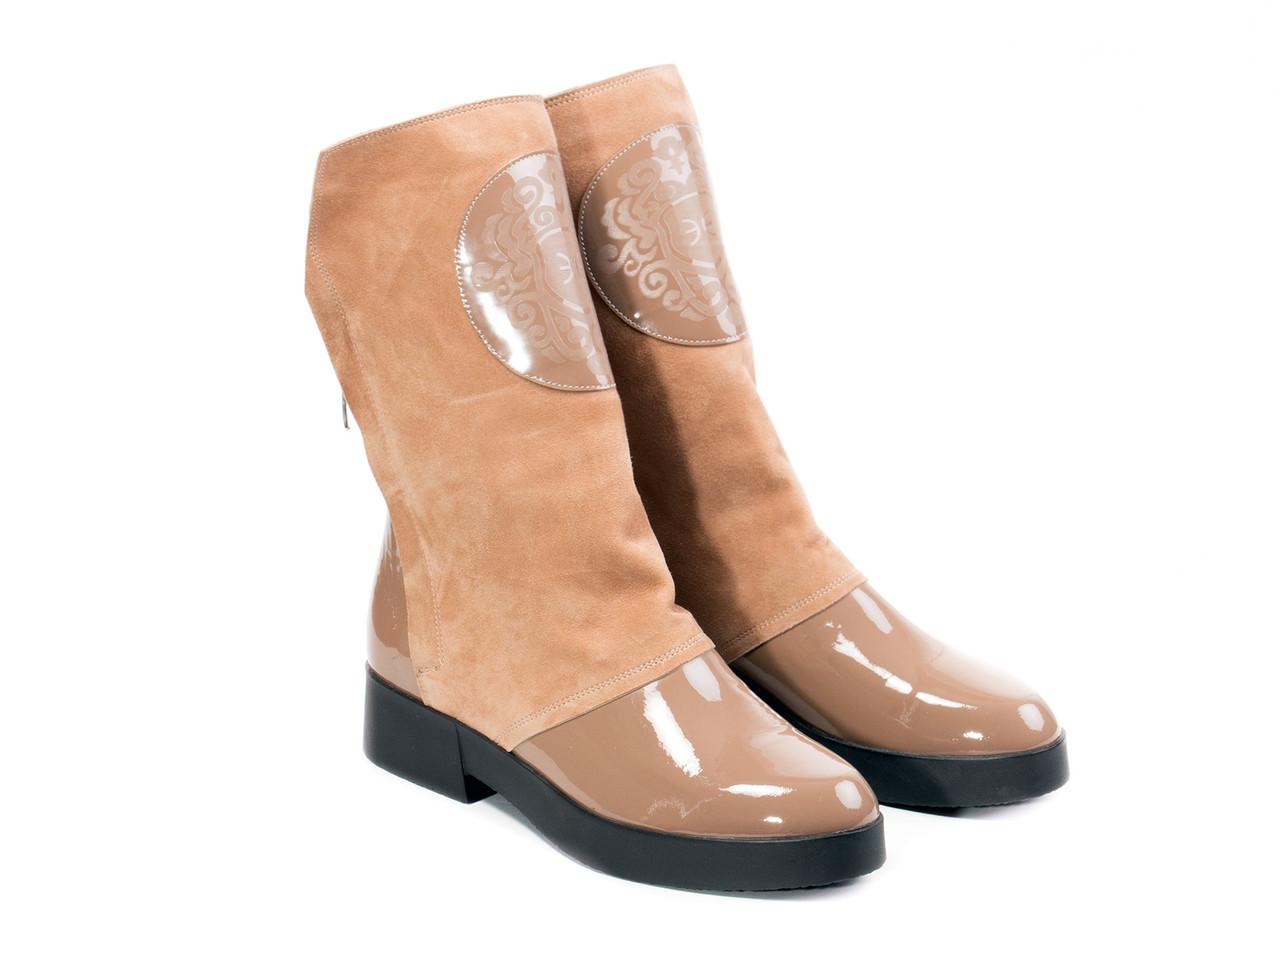 Ботинки Etor 4937-7235 37 бежевые